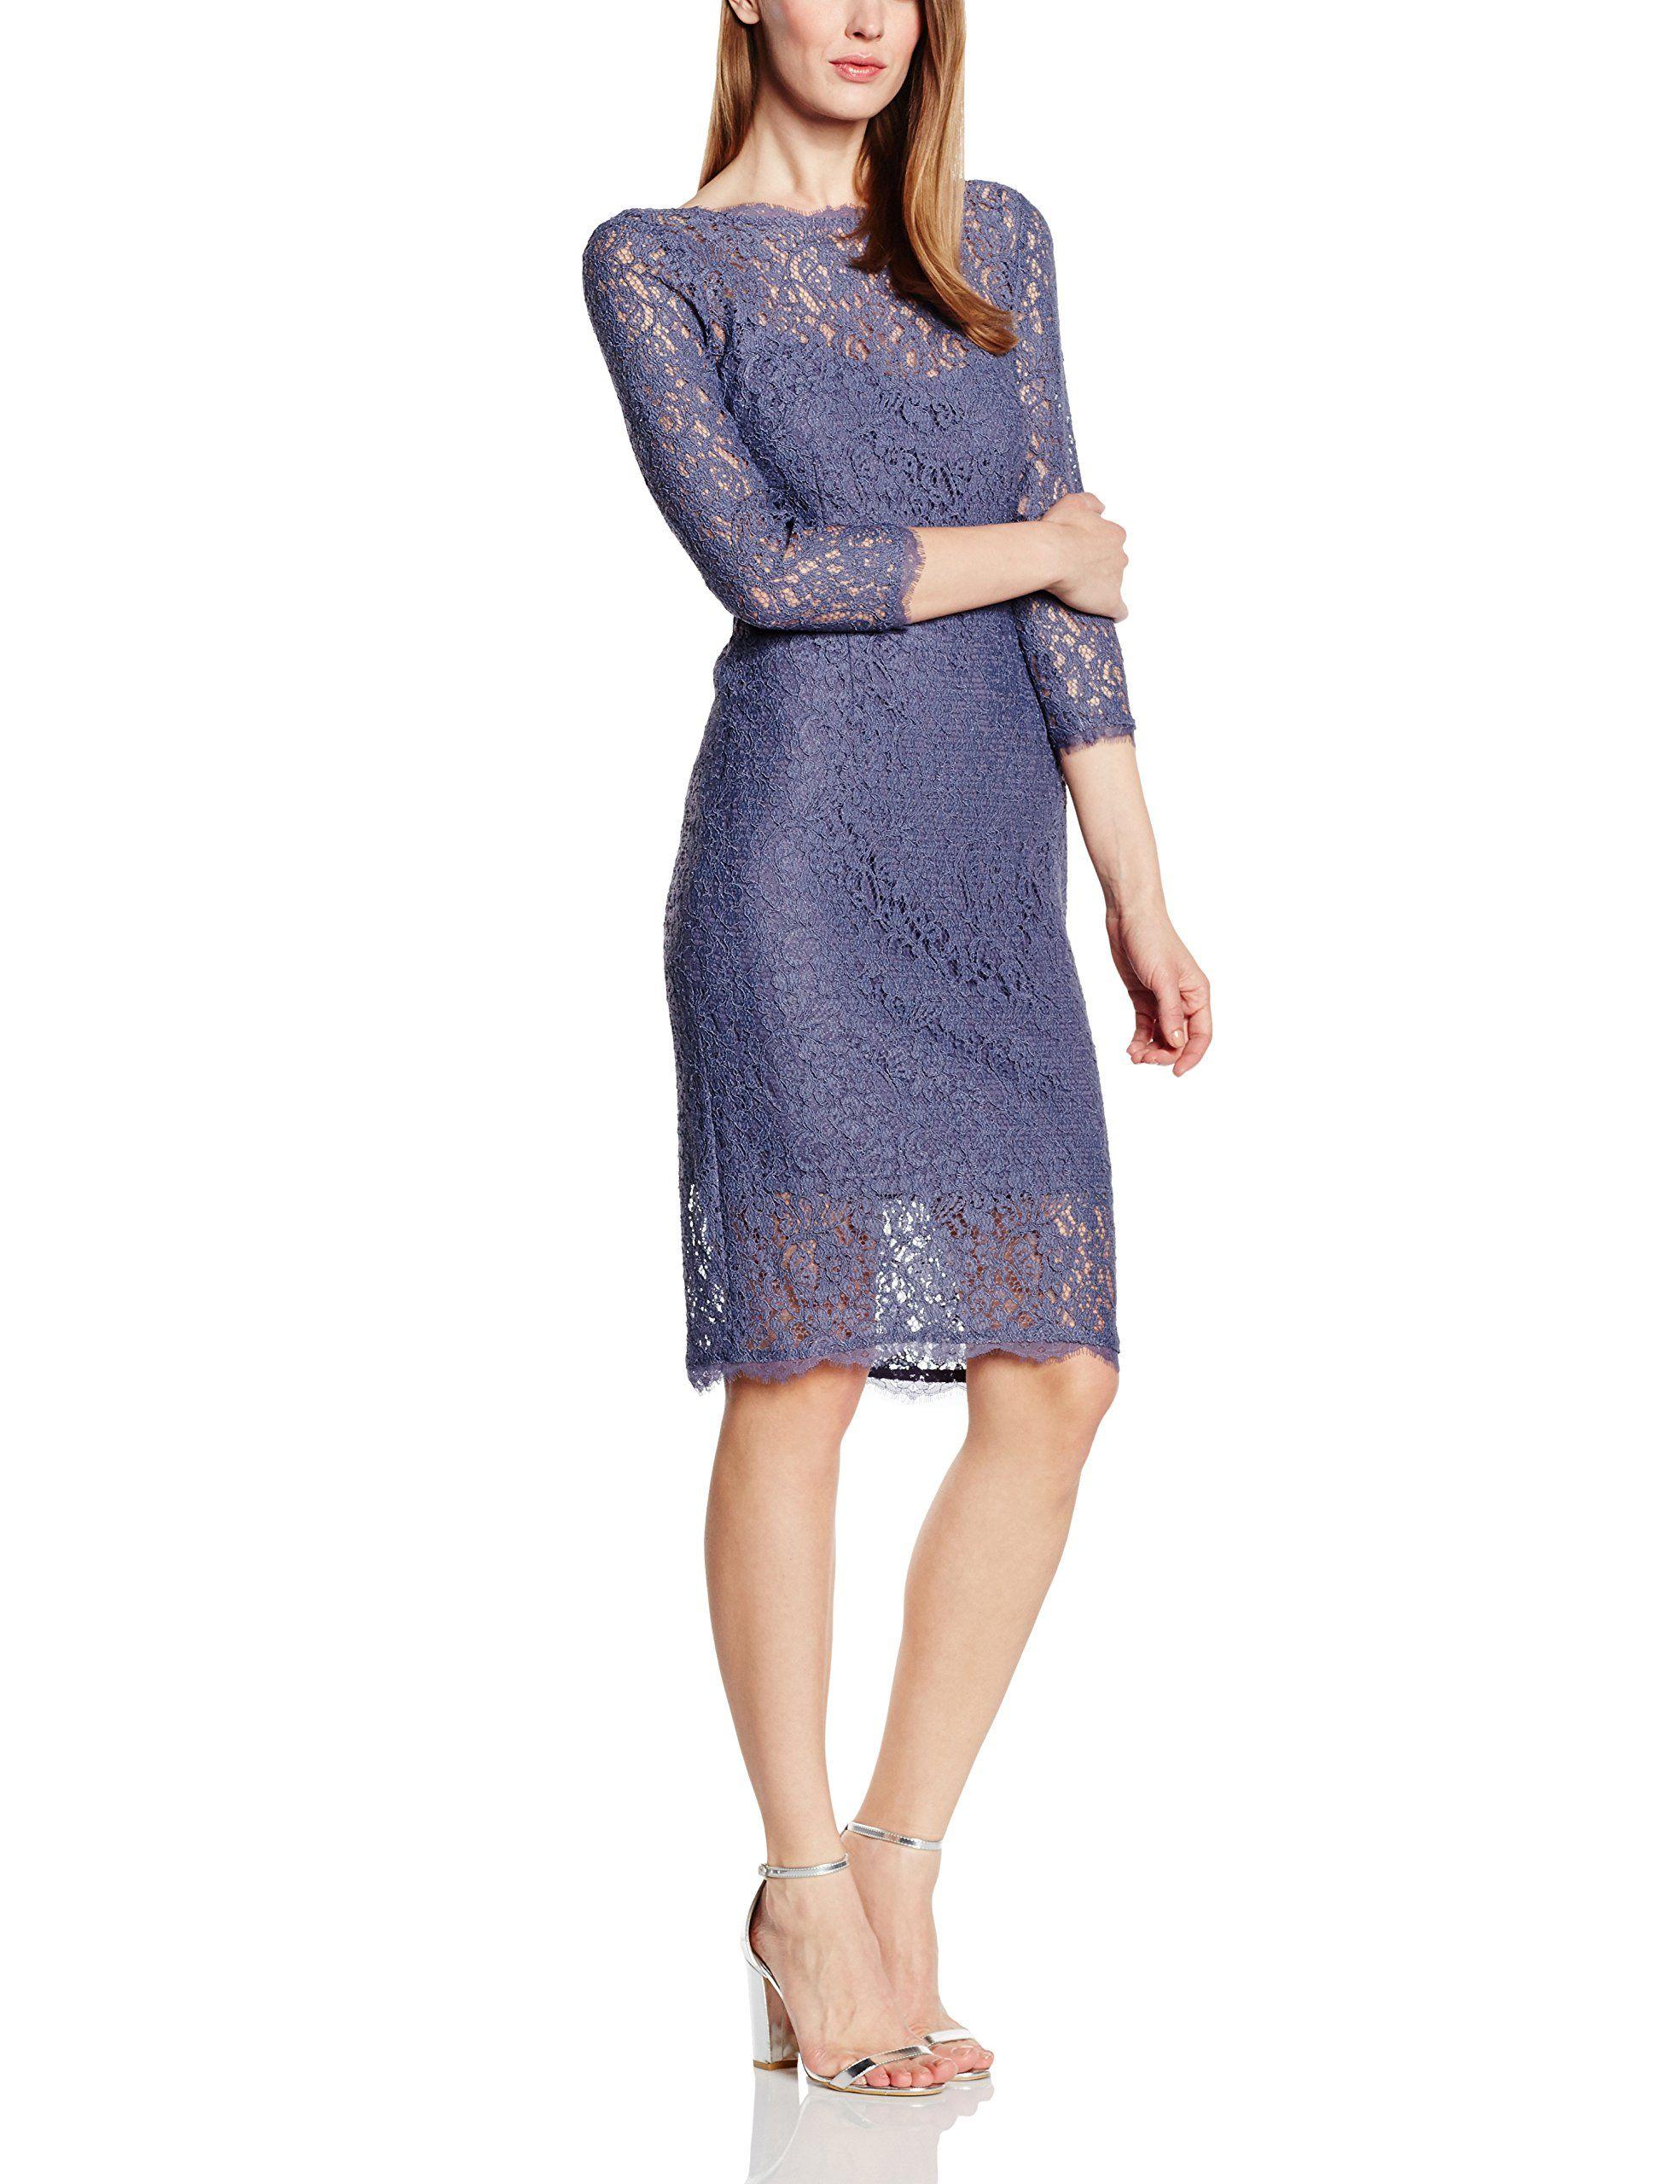 Robot Check Cocktail Dress Lace Cocktail Evening Dresses Long Sleeve Lace Dress [ 2560 x 1969 Pixel ]